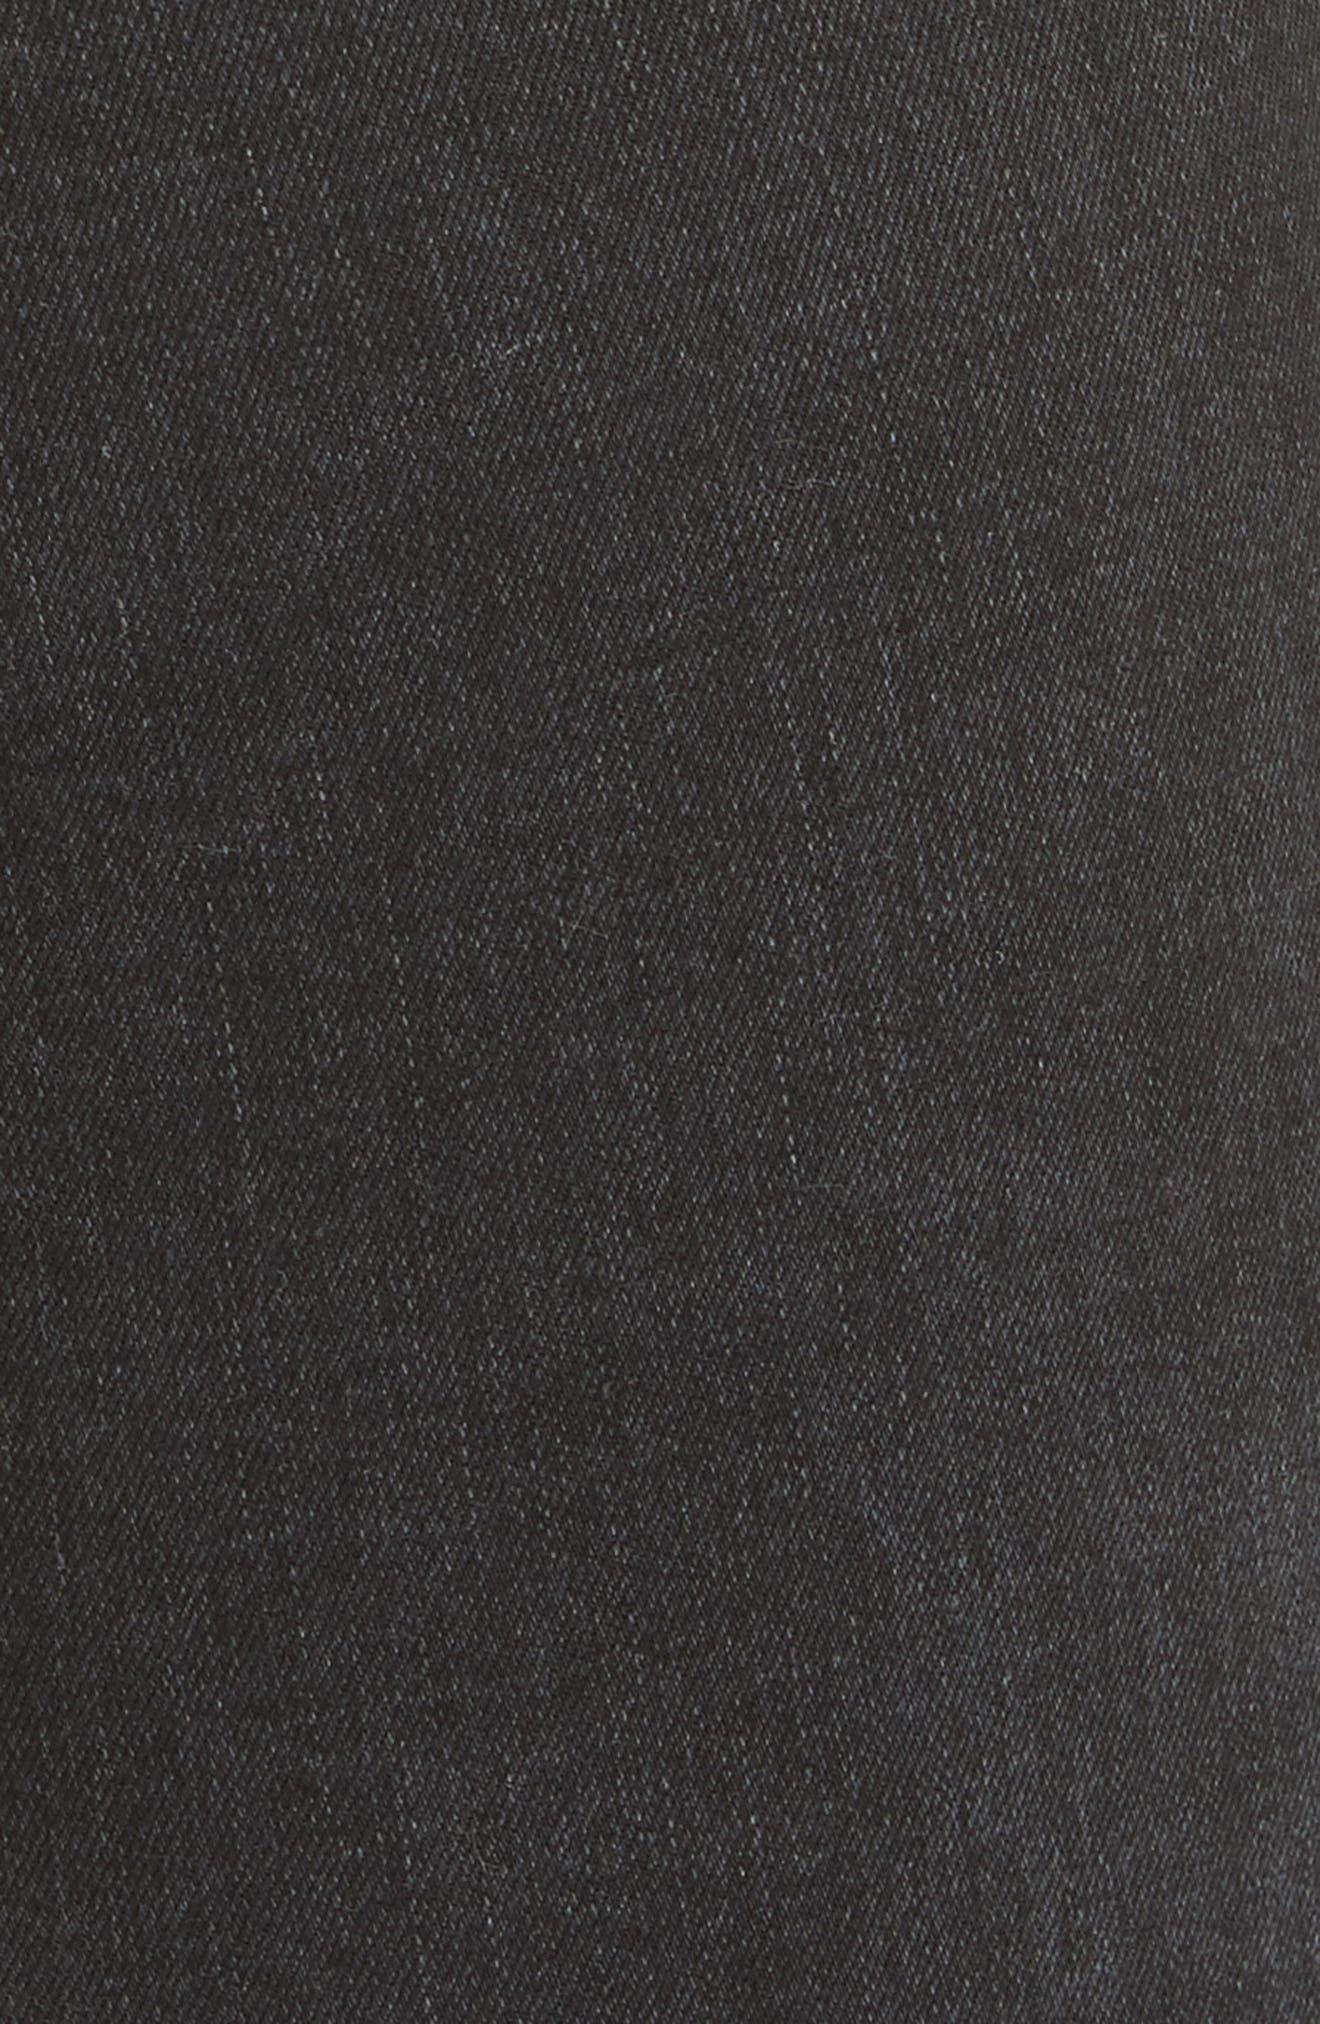 Ultra High Waist Crop Bootcut Jeans,                             Alternate thumbnail 6, color,                             001